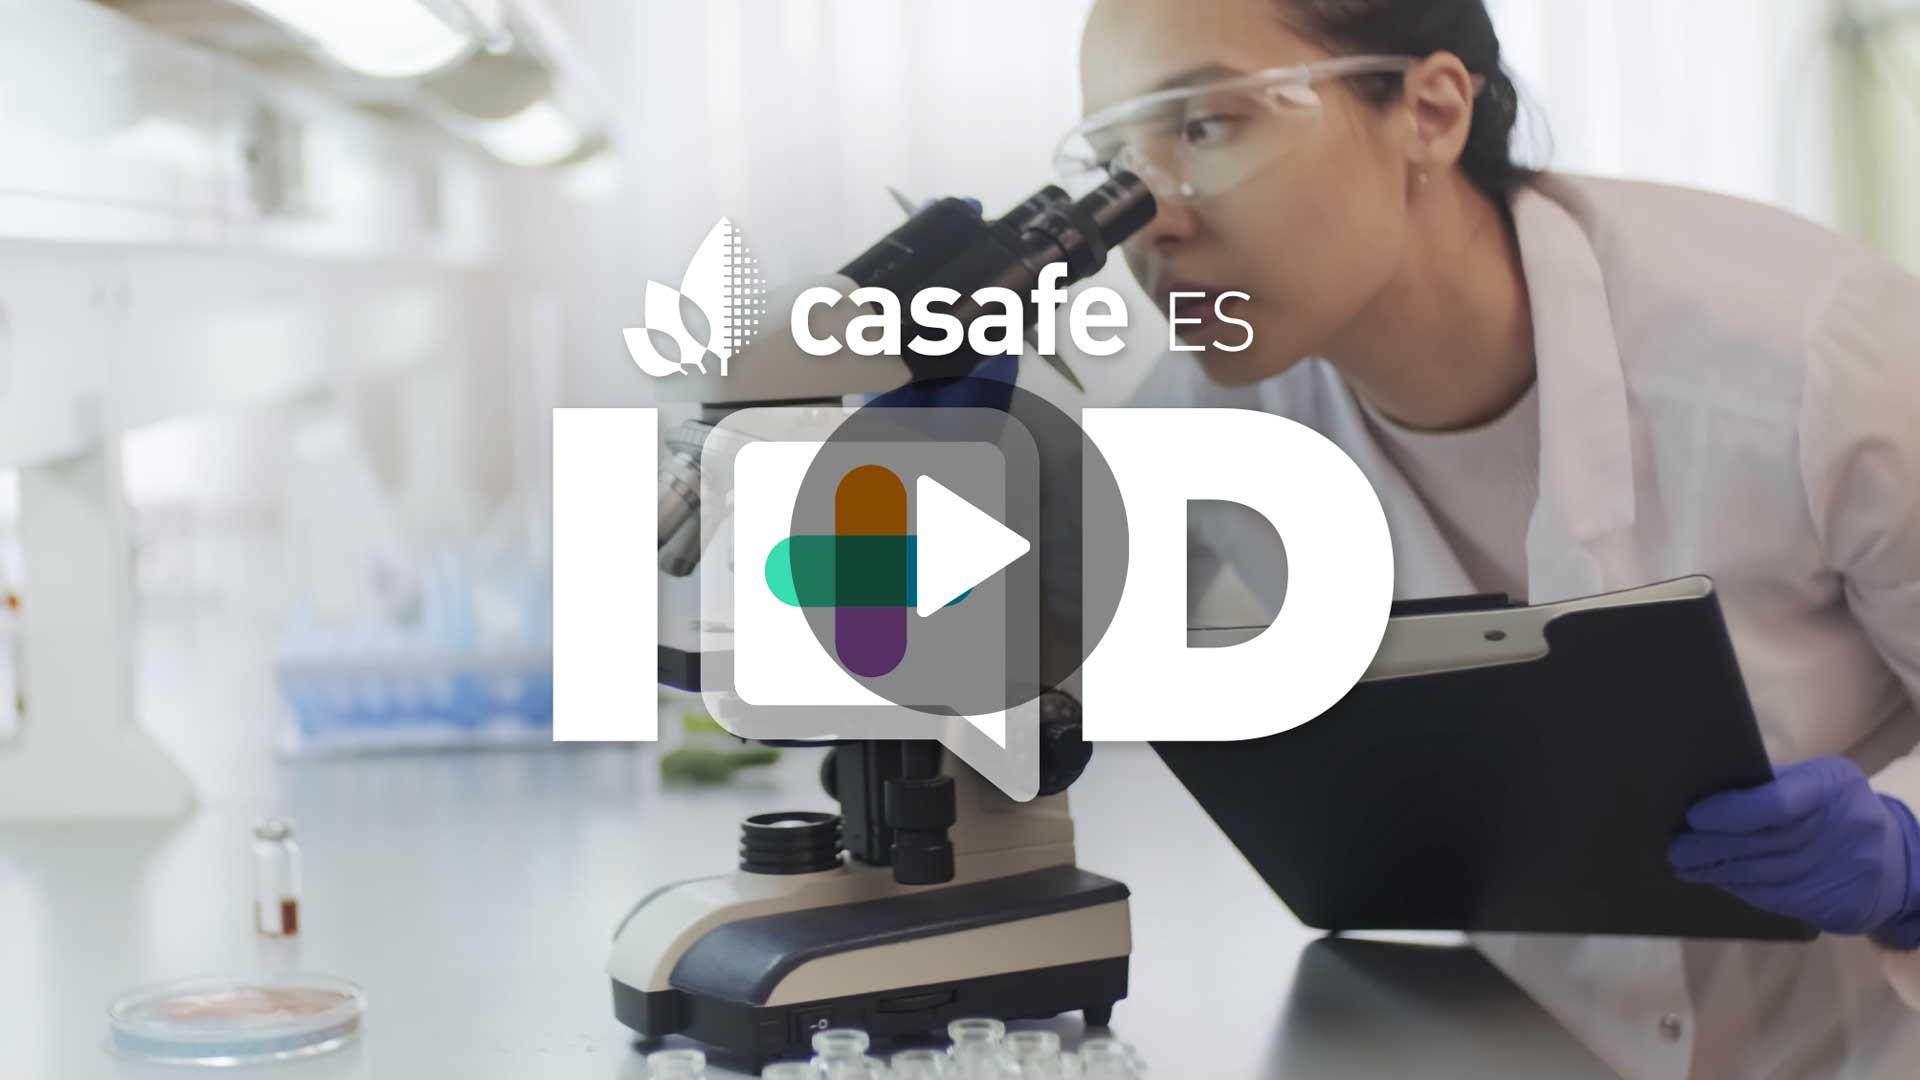 video-Casafe-es-I+D